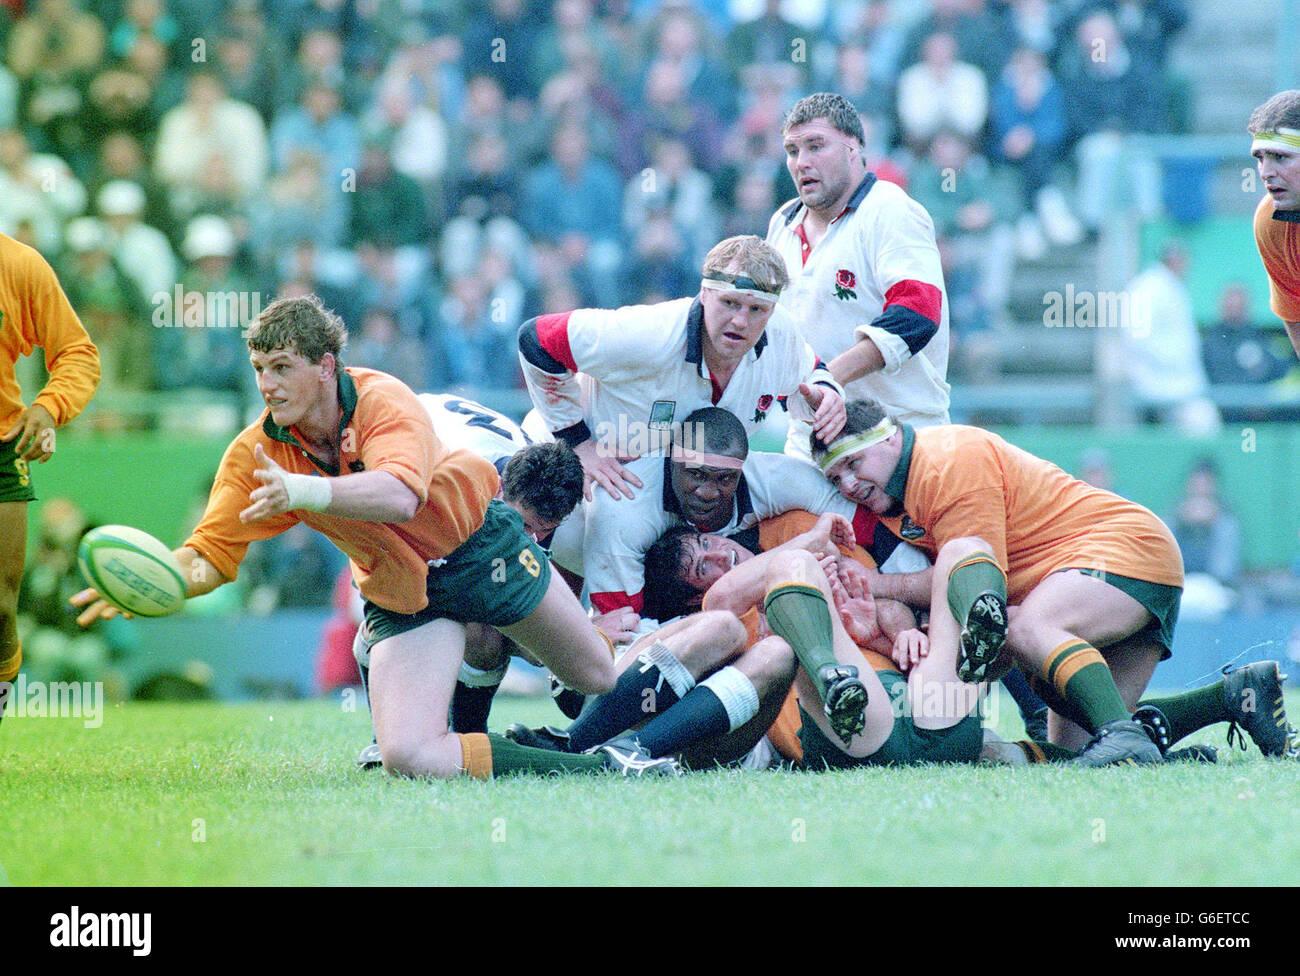 1995 World Cup England vs Australia - Stock Image